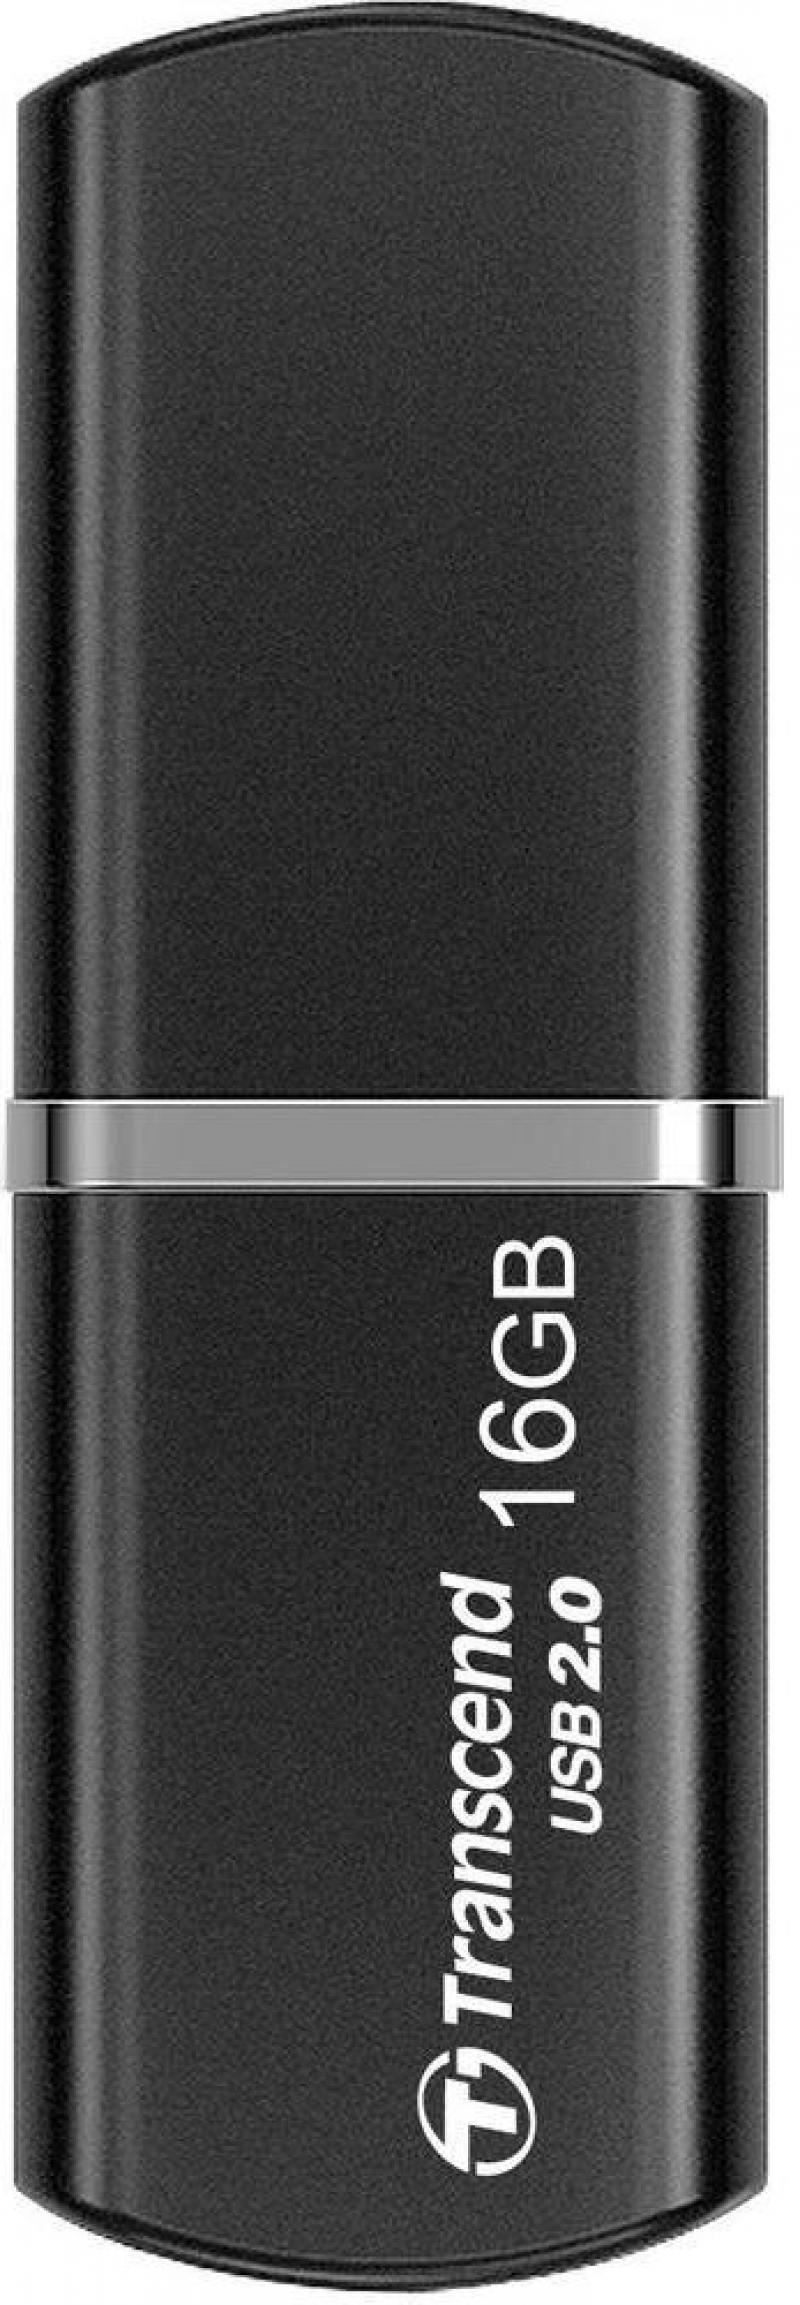 Флешка USB 16Gb Transcend JetFlash 320K TS16GJF320K черный